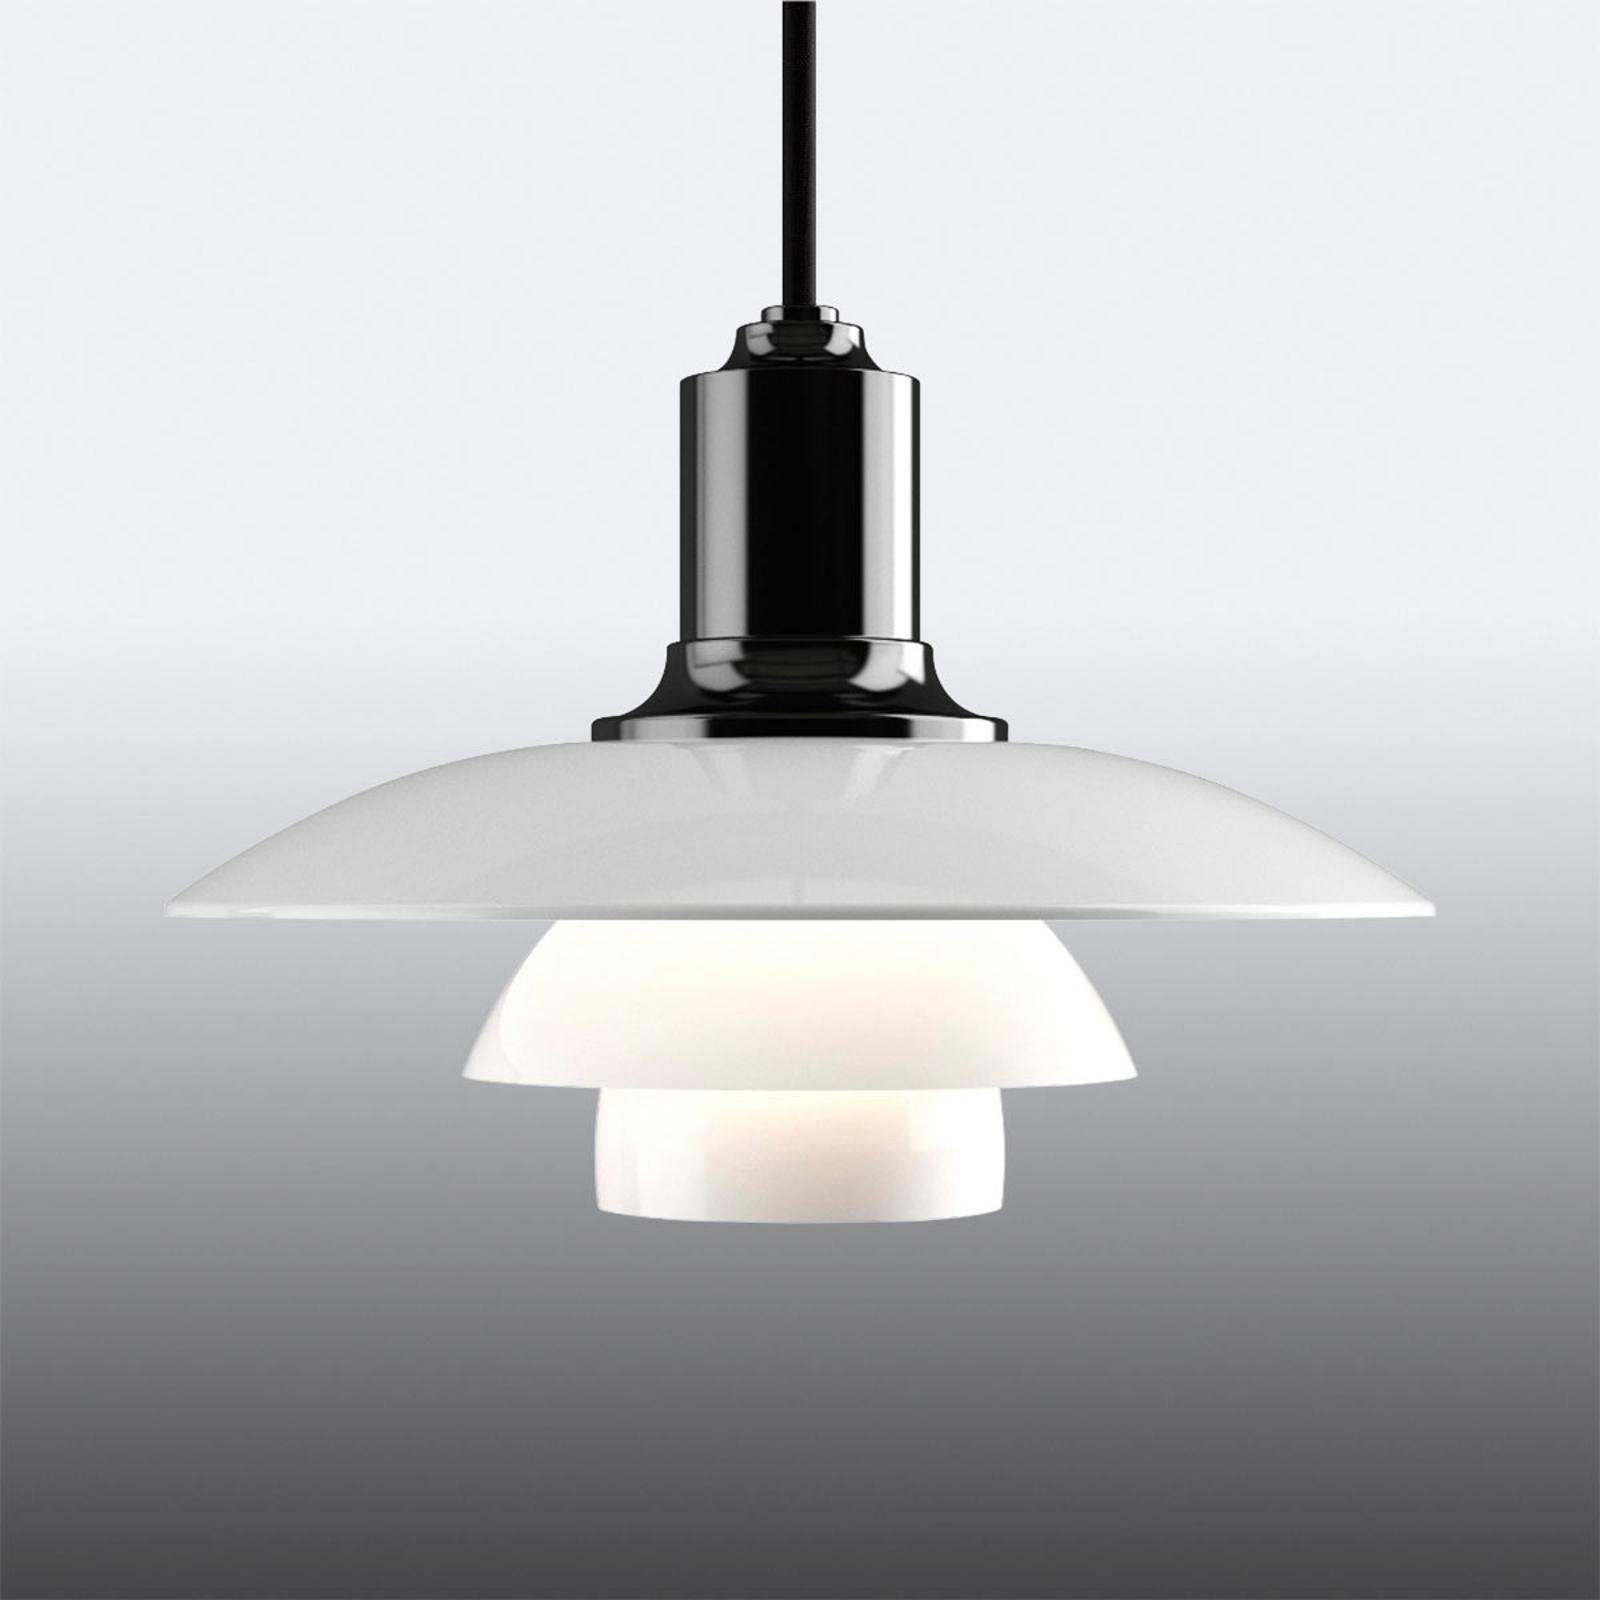 Hanglamp PH 2/1 m. drievoudige glazen kap, zwart